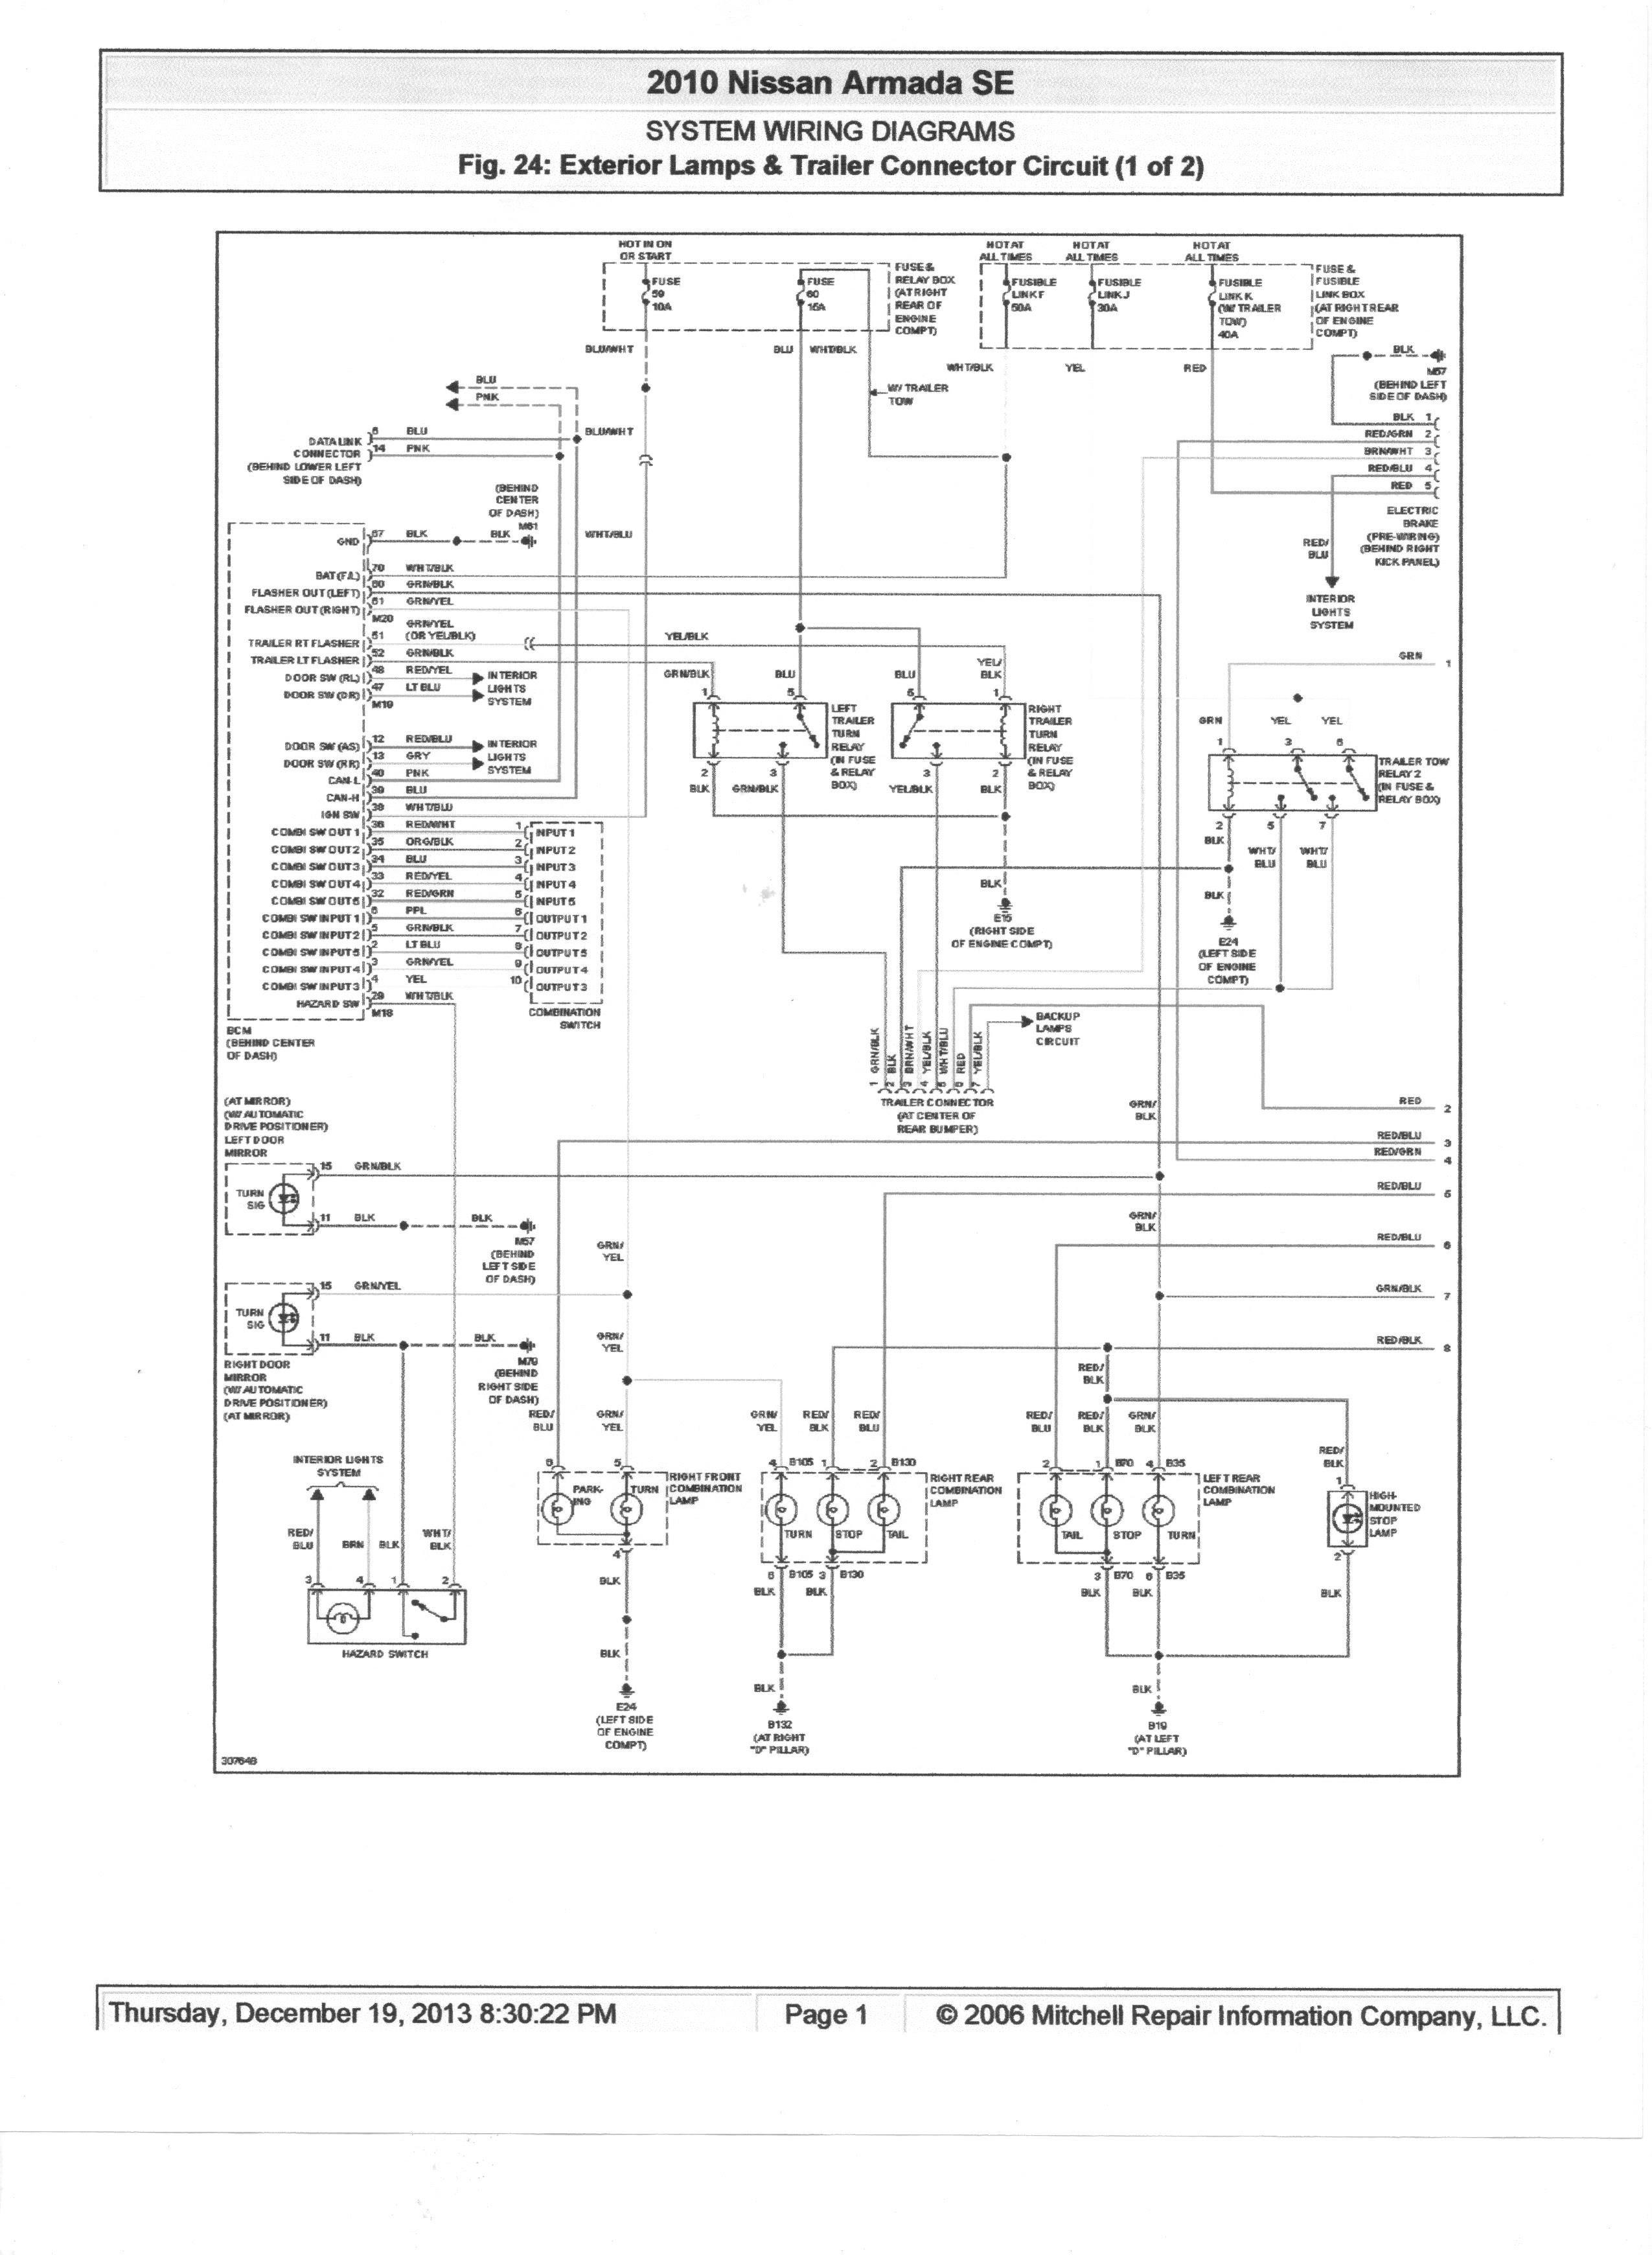 2006 Nissan Maxima Fuse Diagram